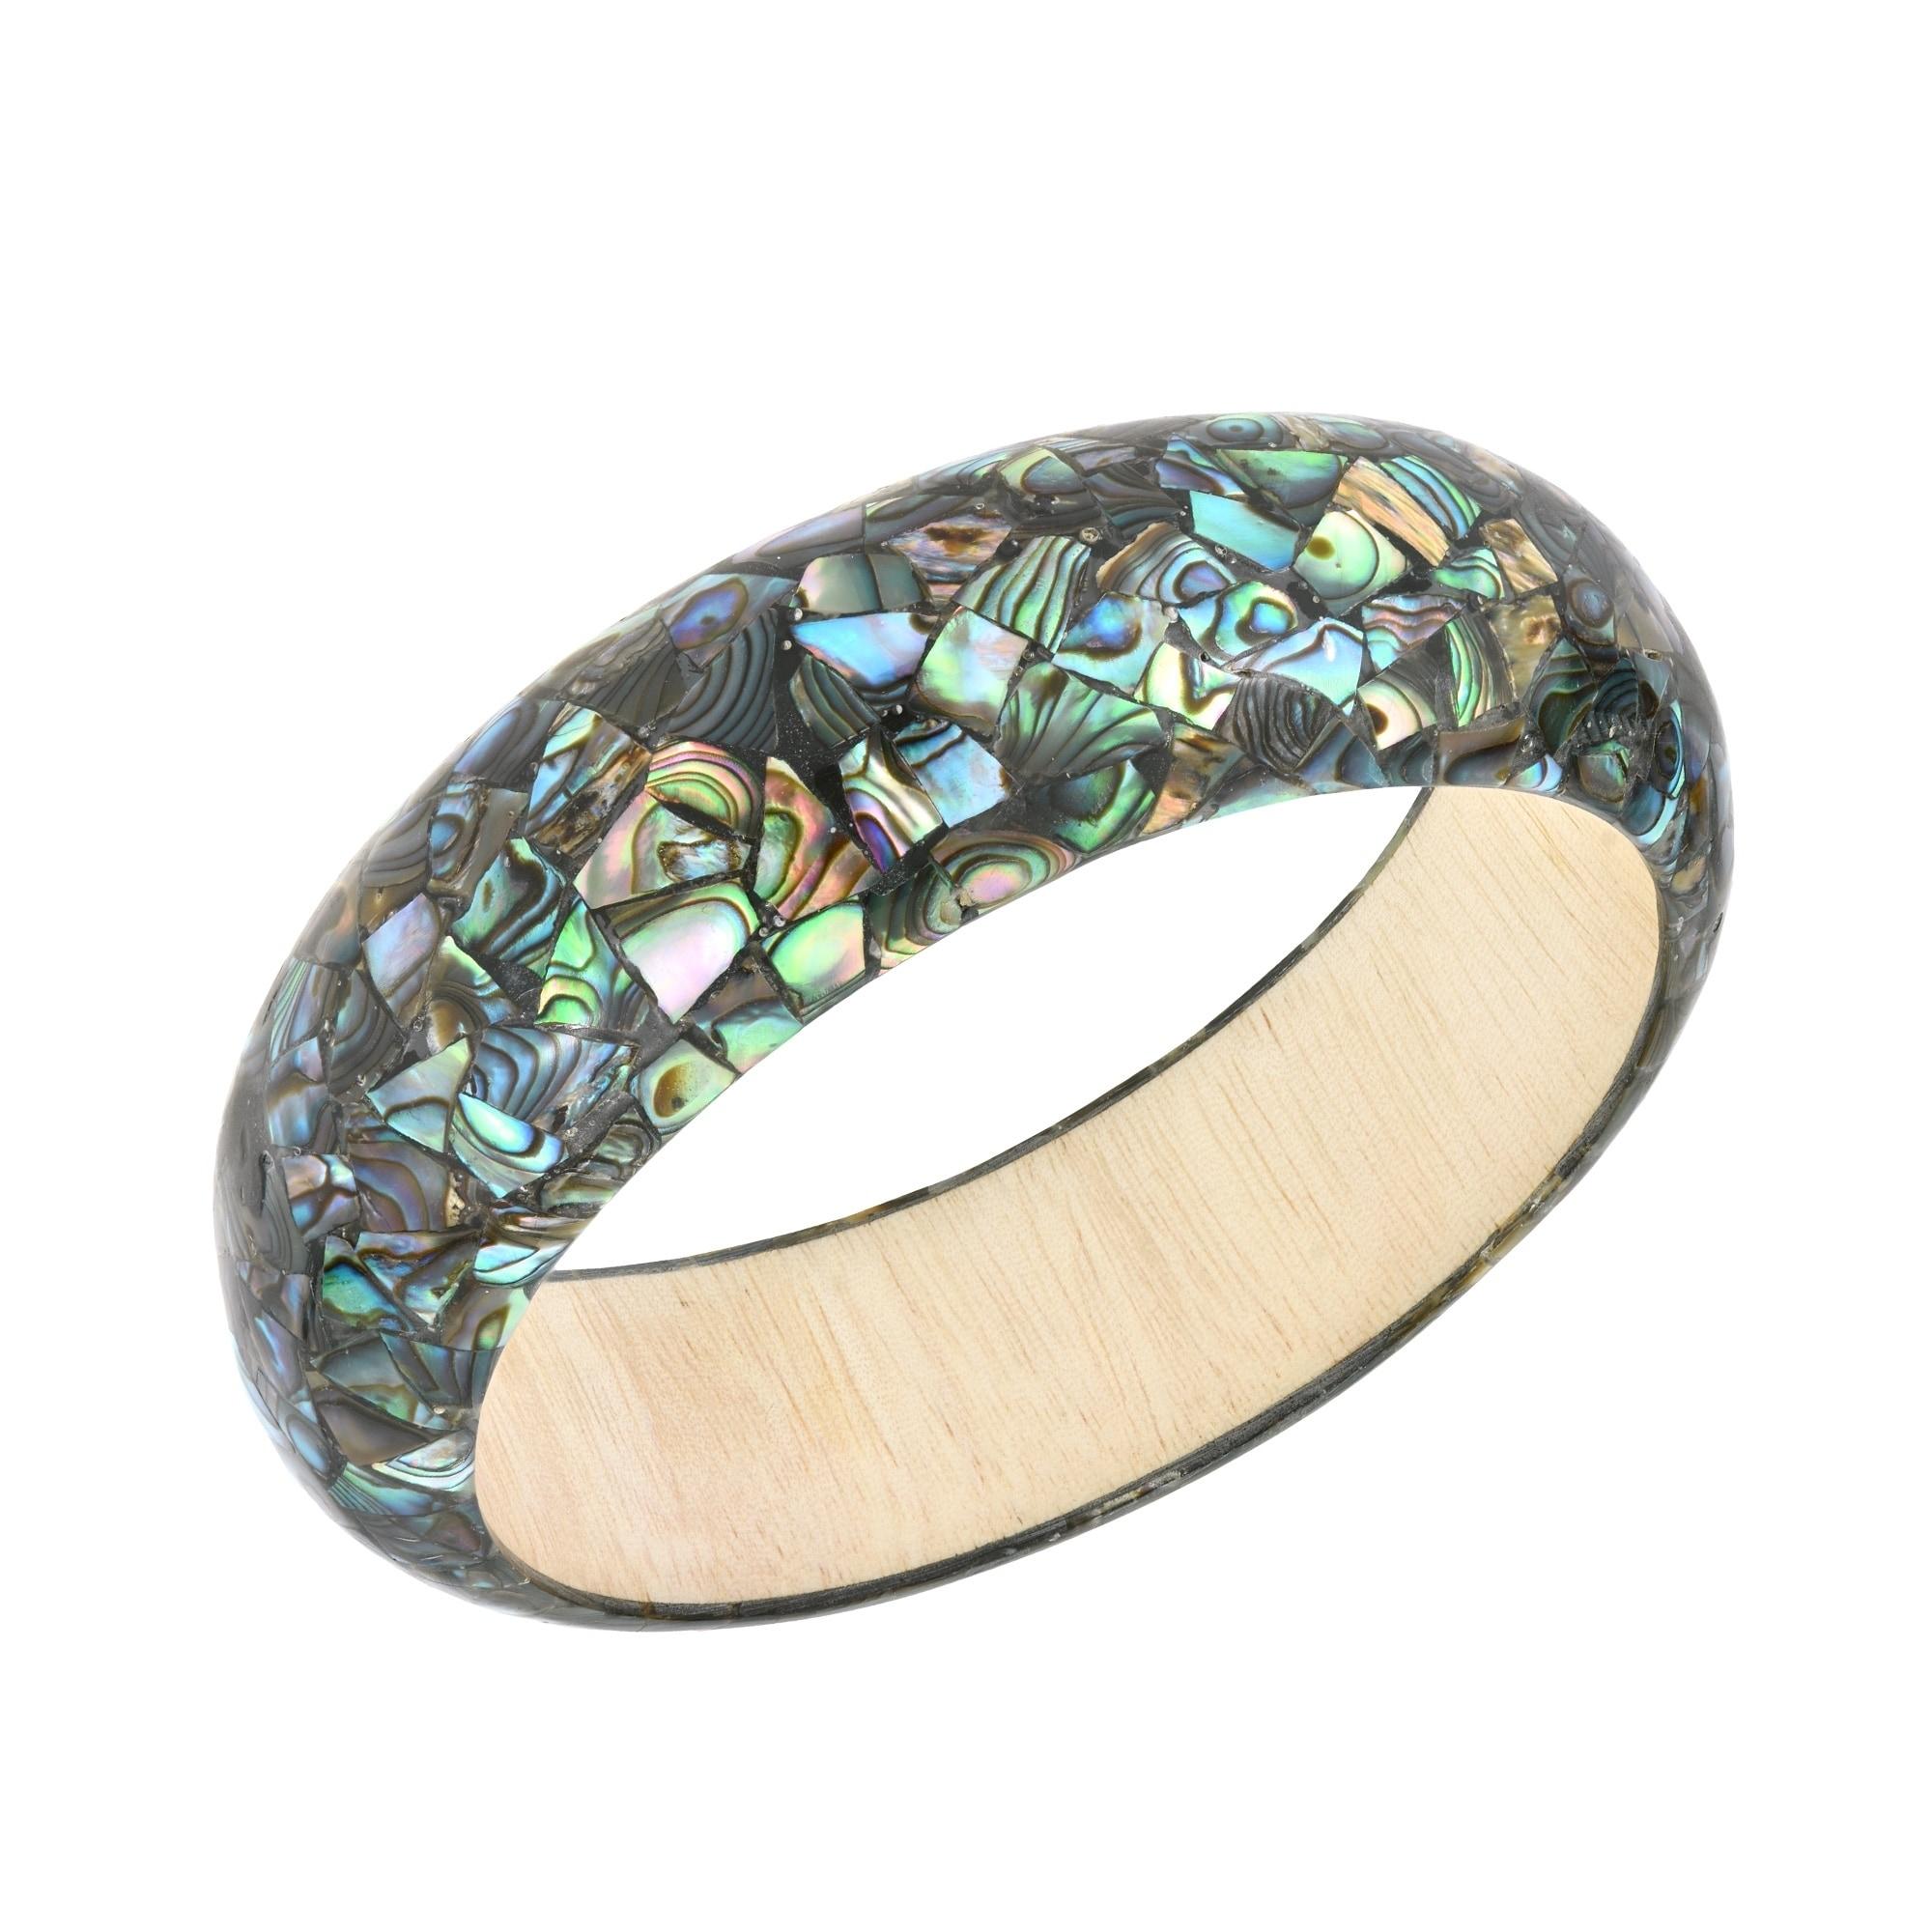 Vintage Unique Puka Abalone Mother Of Pearl Mosaic Inlaid Asymmetrical  Bangle Bracelet